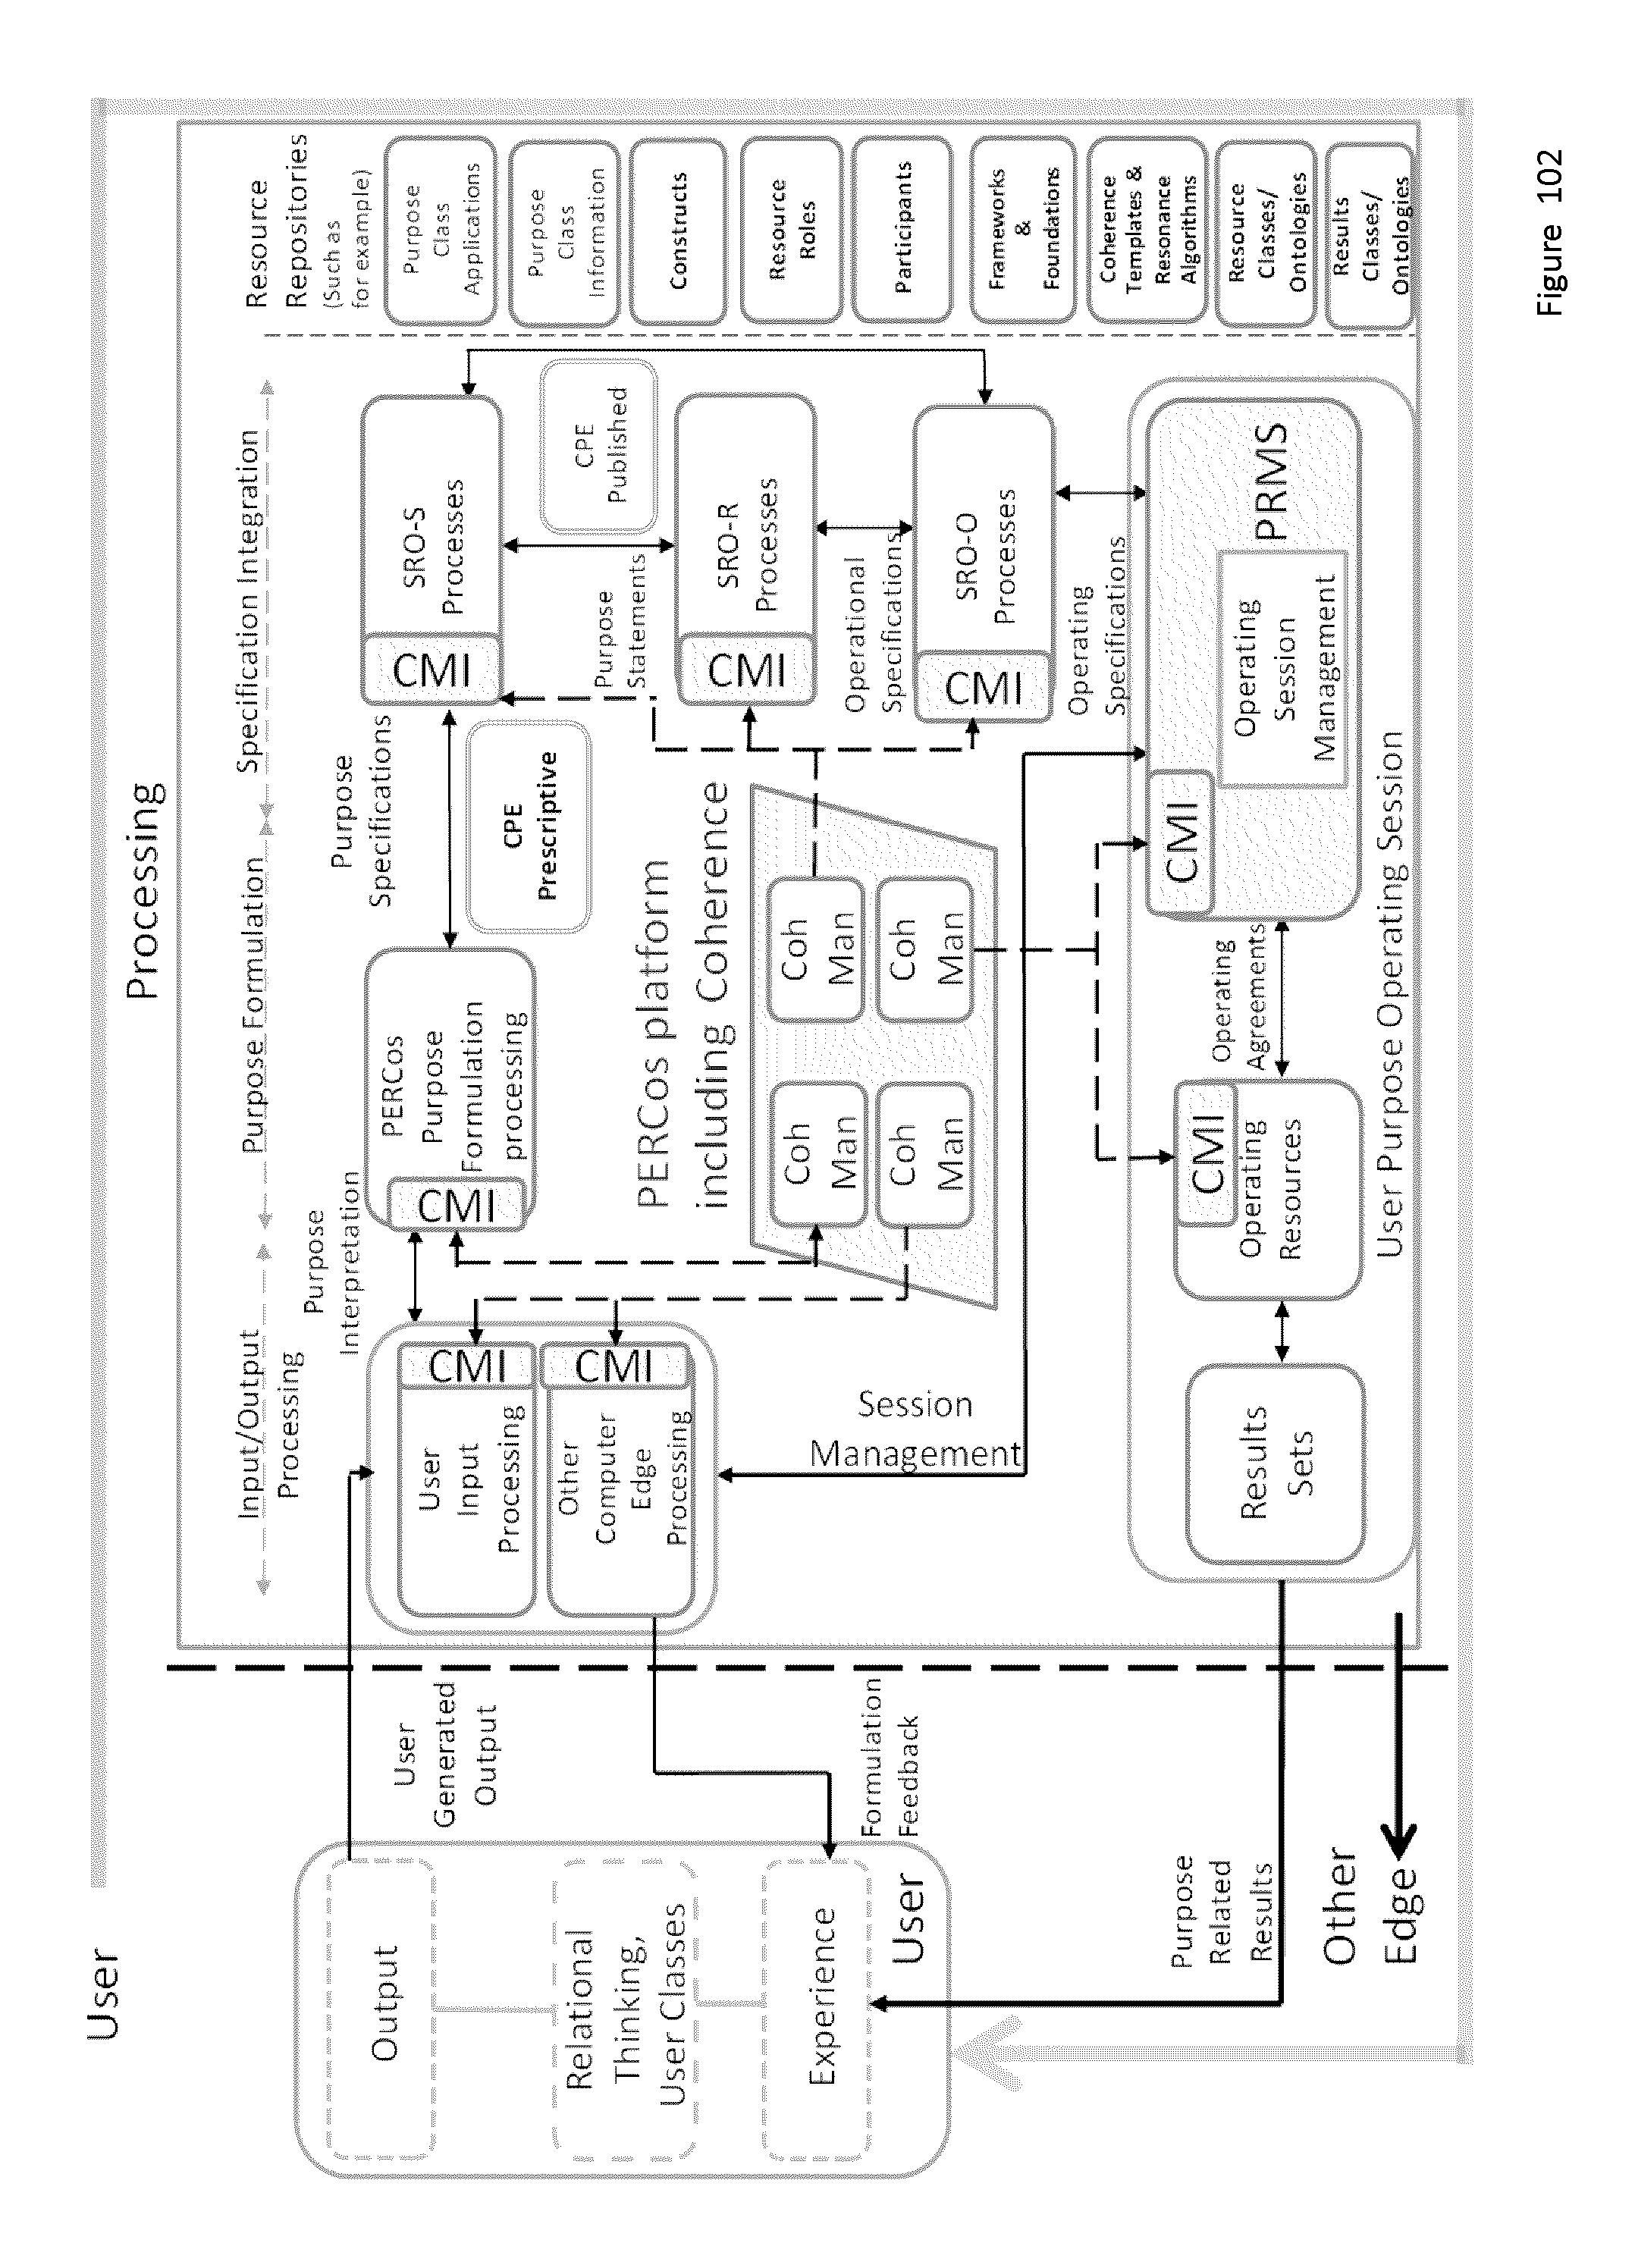 Patent US 10,075,384 B2